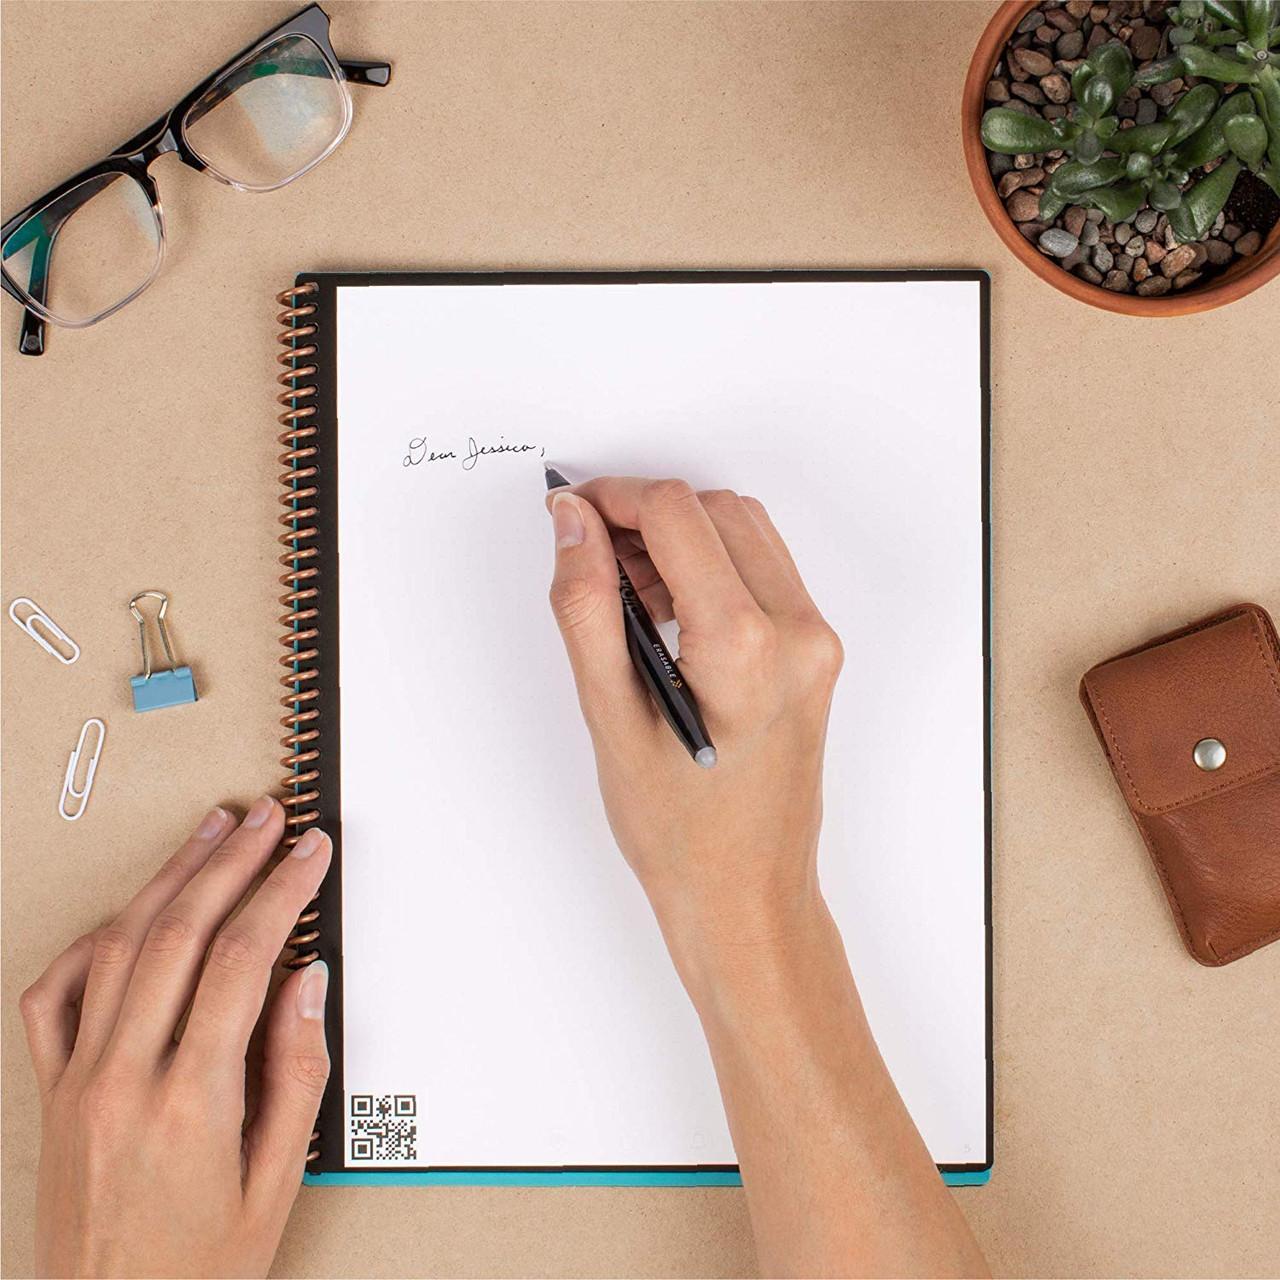 Rocketbook EVR-E-K-CKG Everlast Smart Reusable Notebook with Pen and Microfiber Cloth, Executive Size, Terrestrial Green